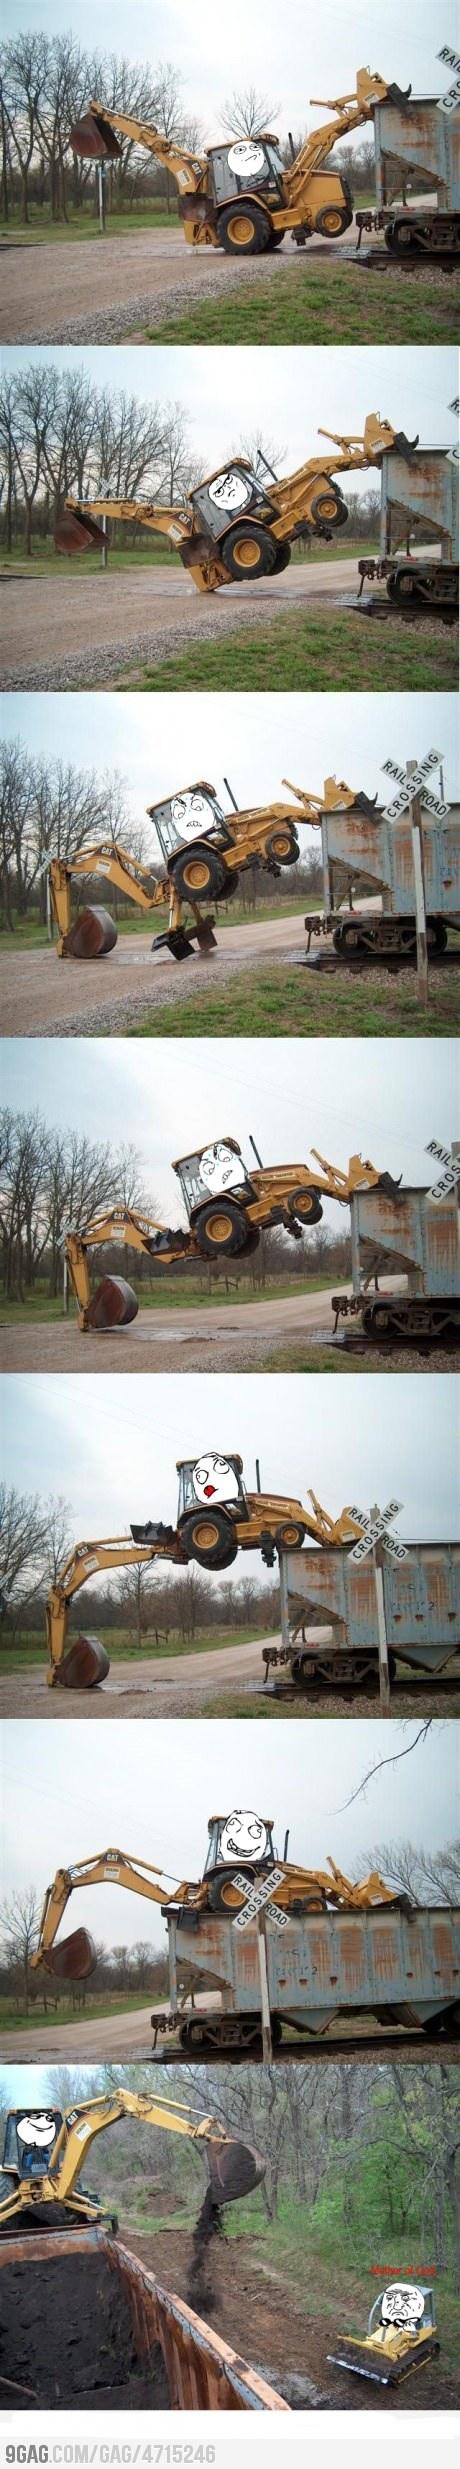 Traktor skills